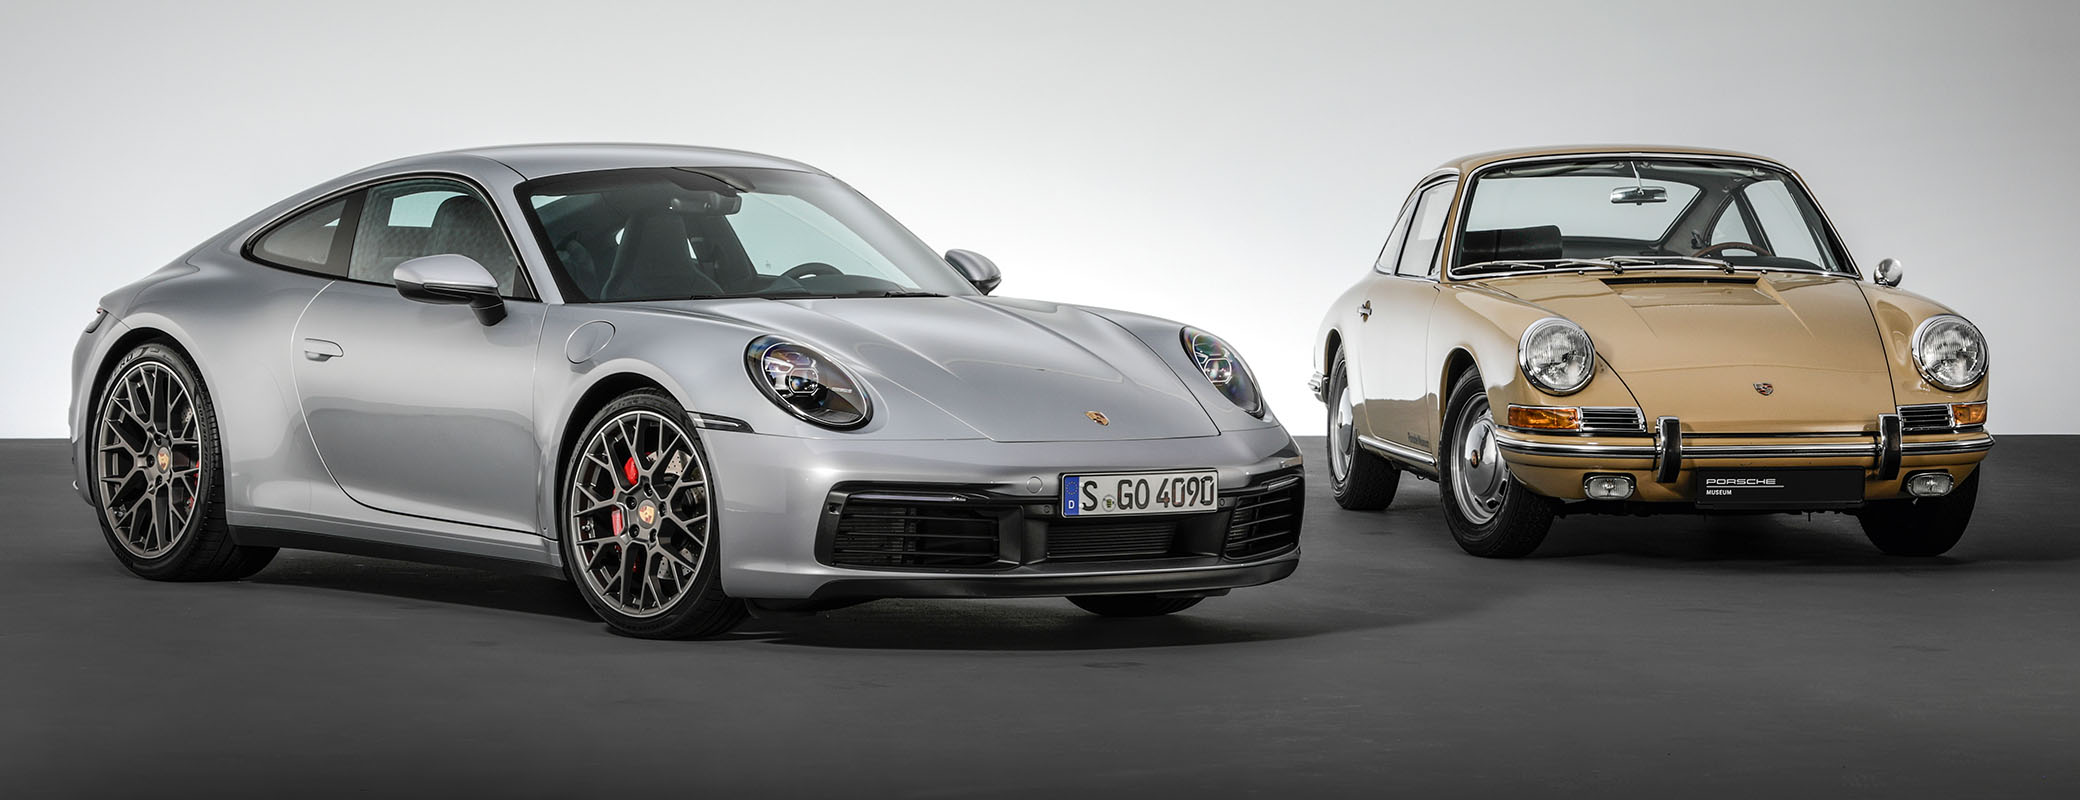 4f95a019e9 911Valencia_Slider_Head-Images_0004_5_Generationen.jpg. Volver. Las siete  generaciones del Porsche 911